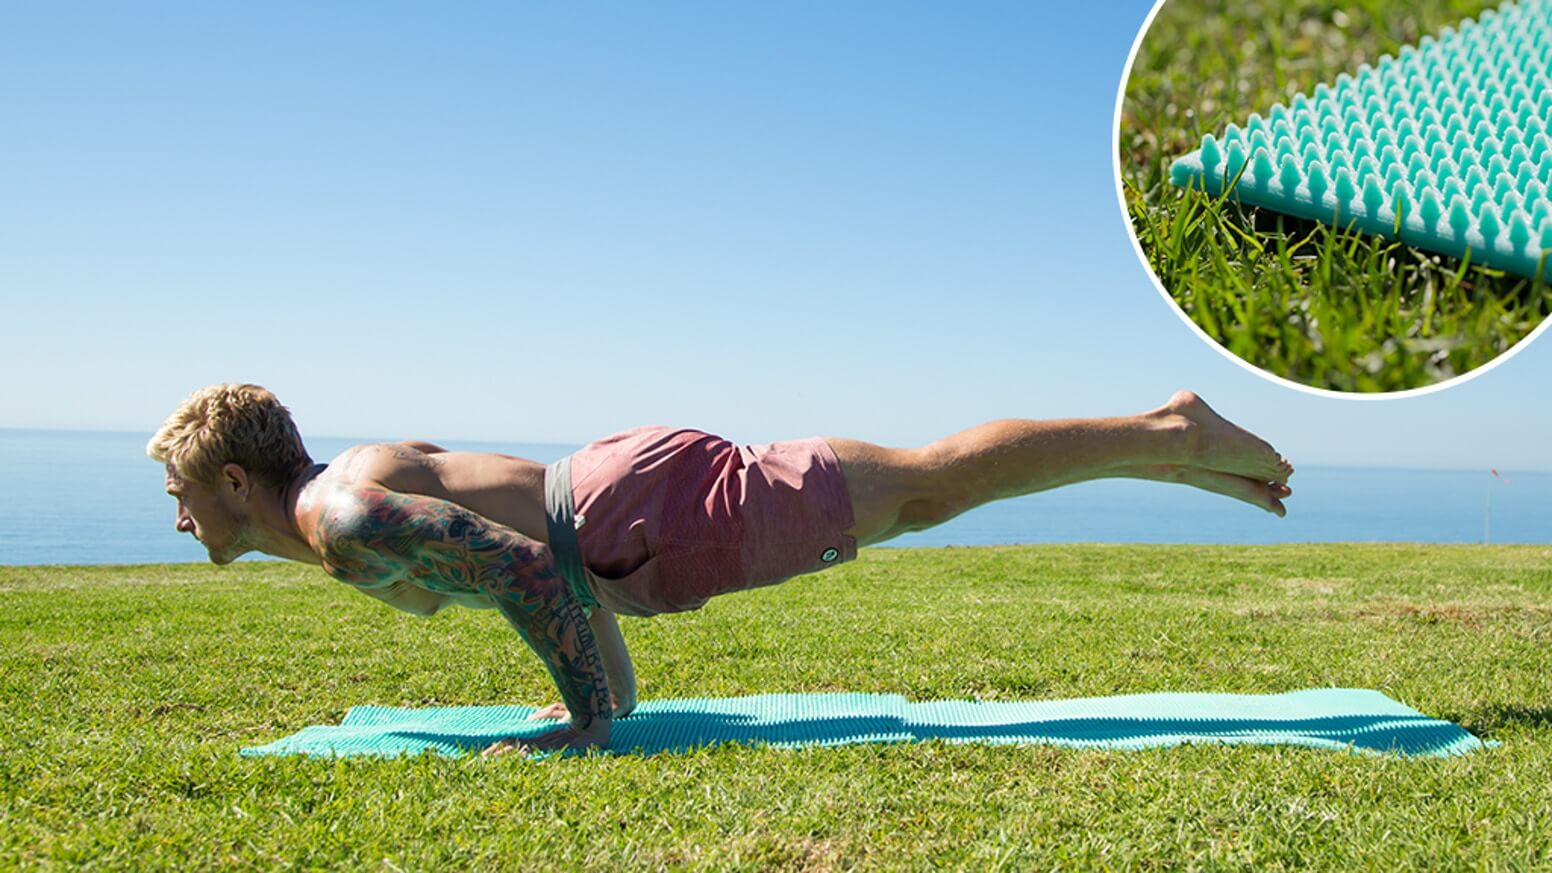 Grippz acupressure yoga mat